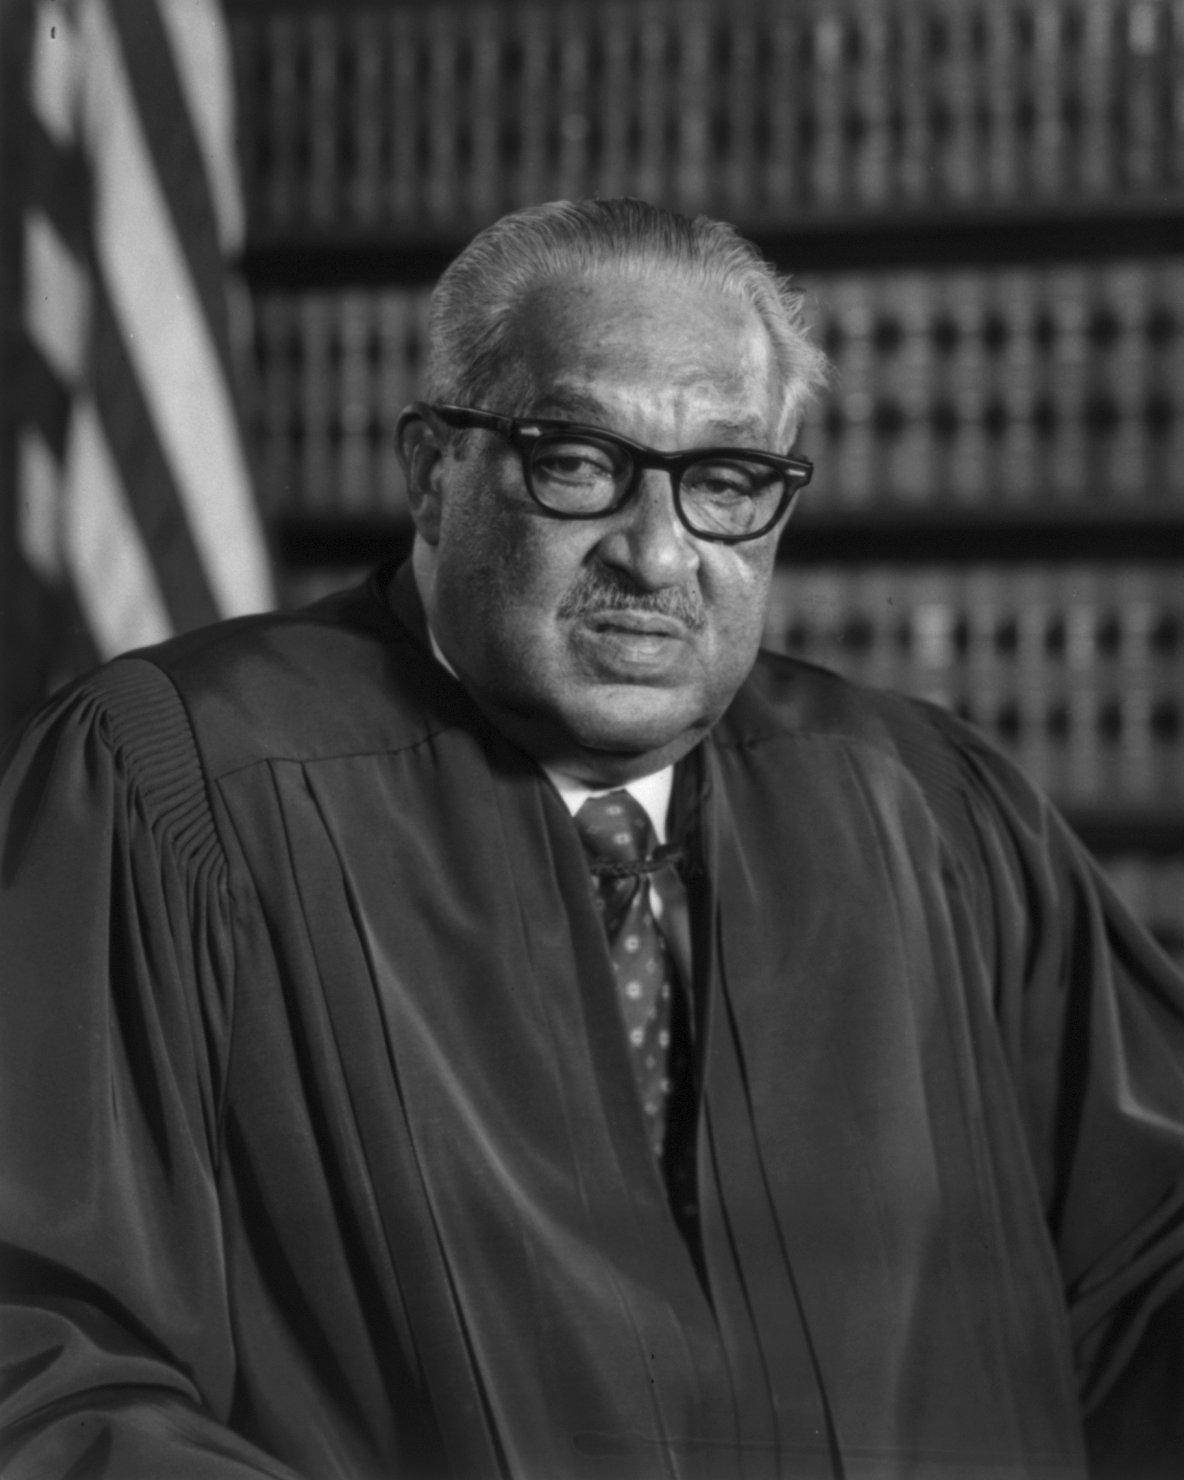 SUPREME COURT JUSTICE THURGOOD MARSHALL - 8X10 PHOTO (DA-434)